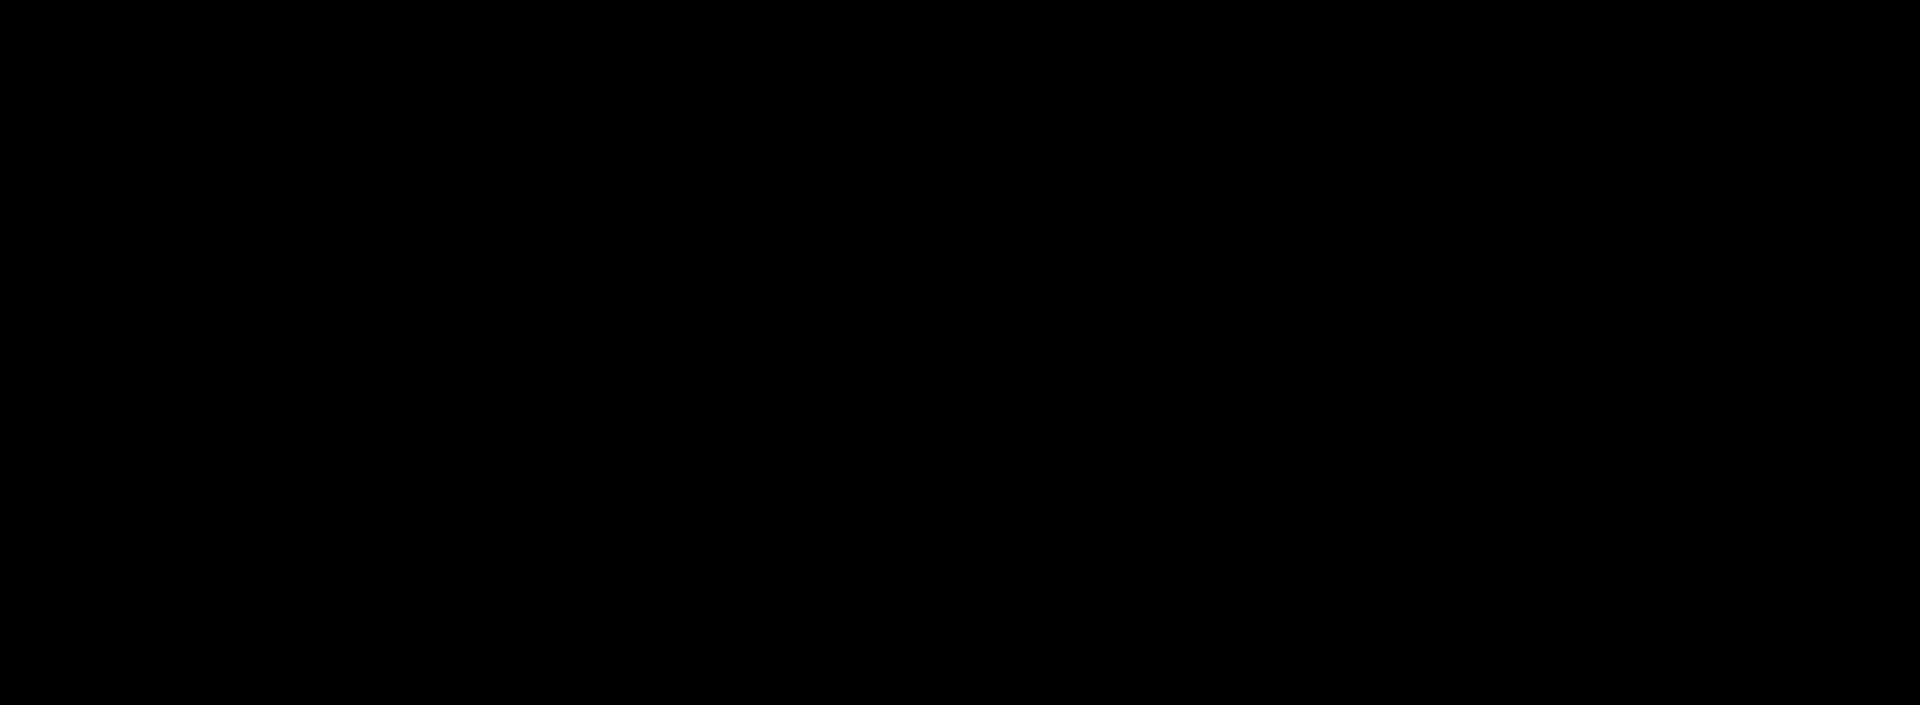 سترات الكالسيوم Calcium Citrate